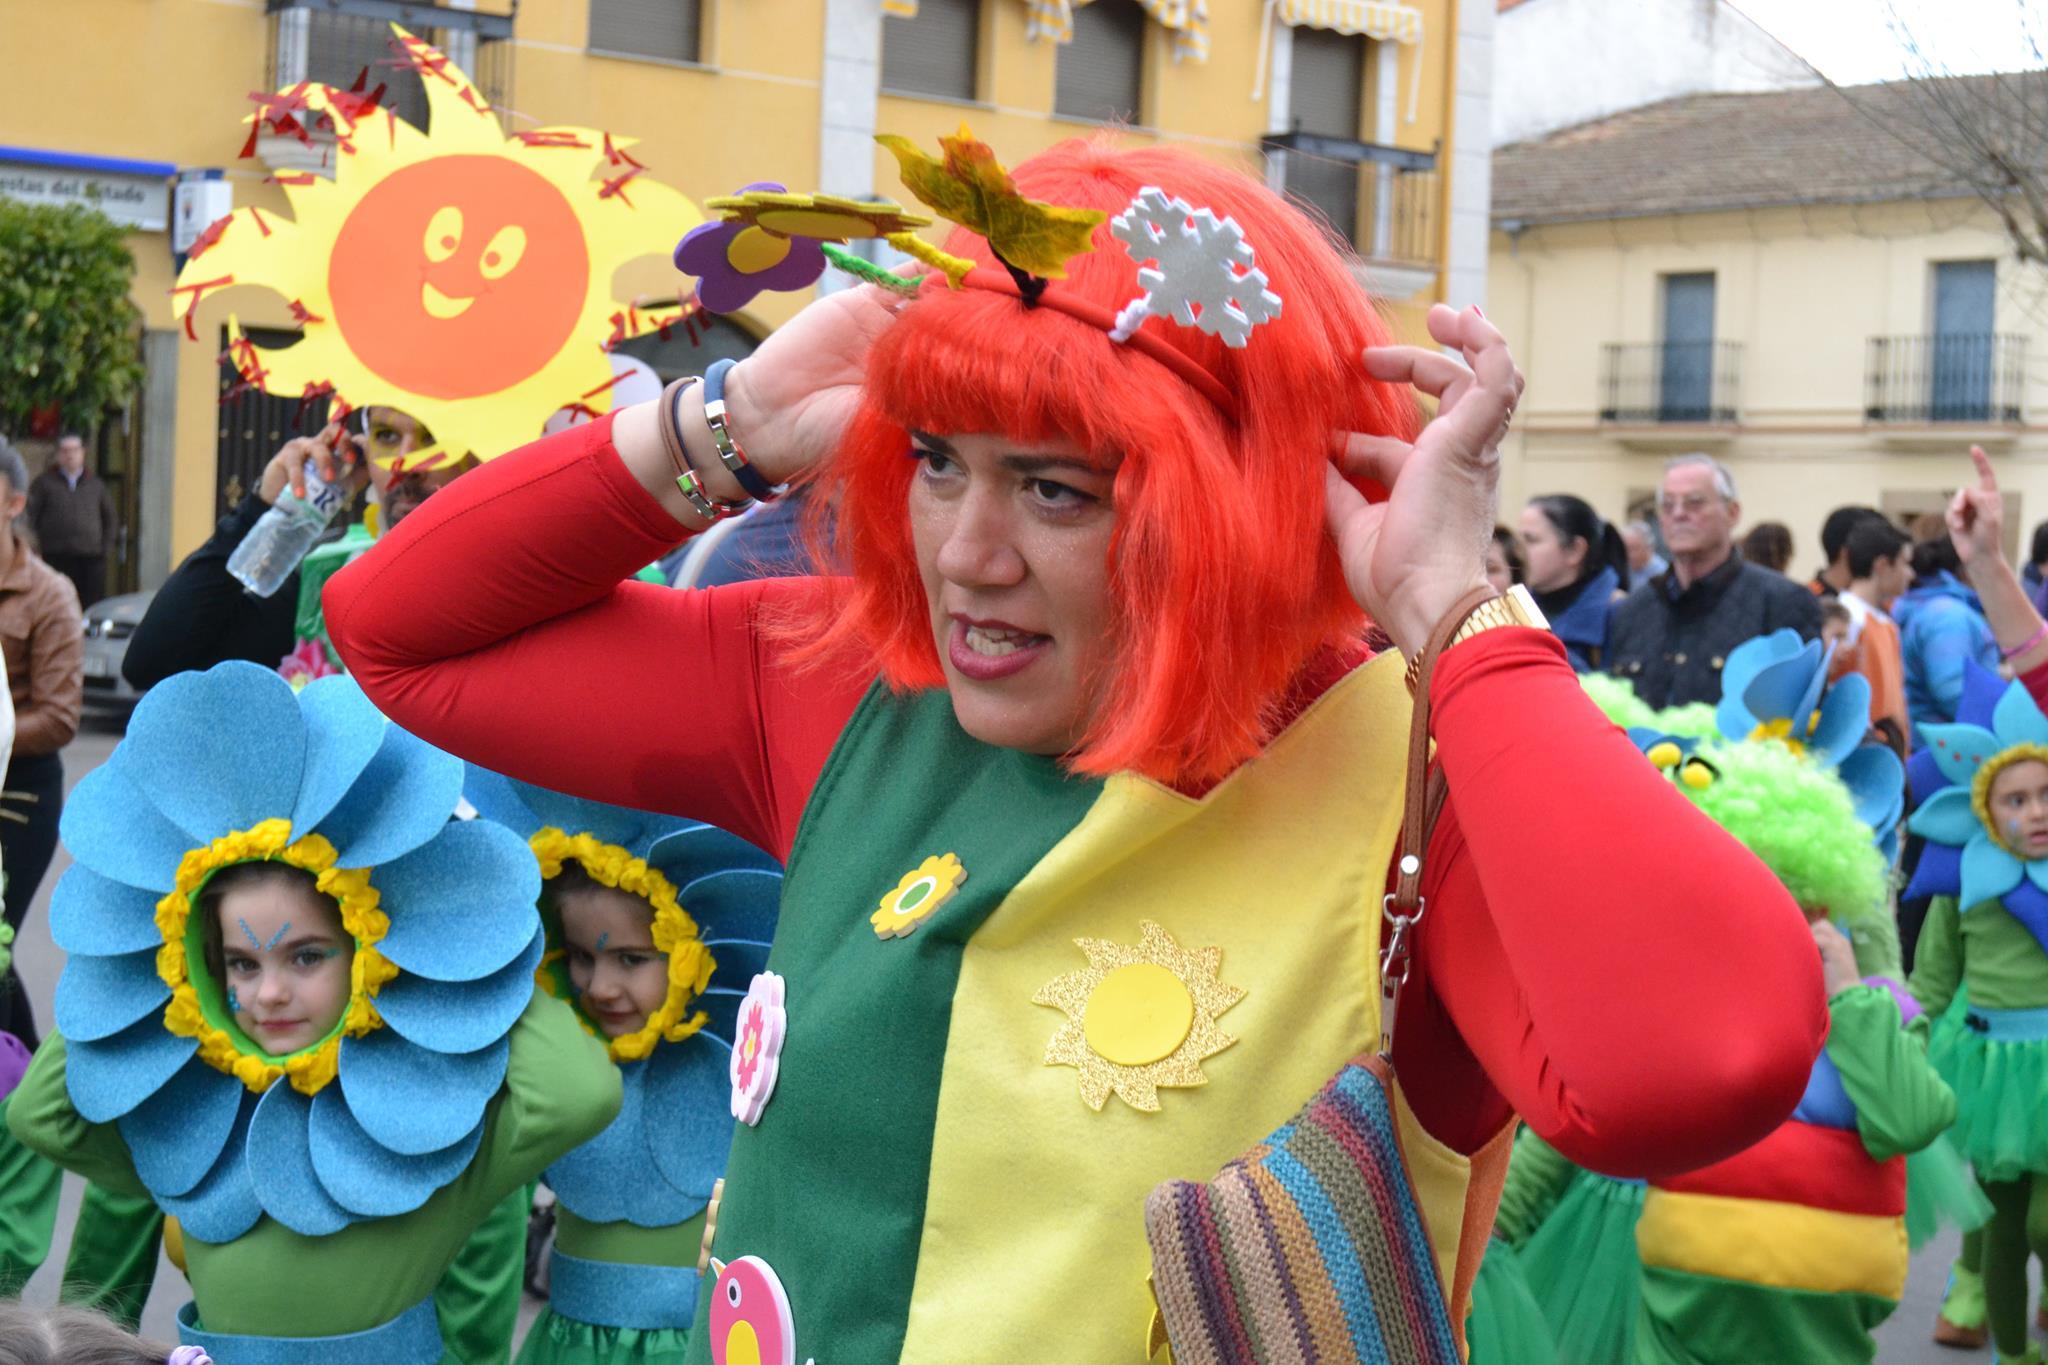 Carnaval 2015: CEIP García Siñeriz